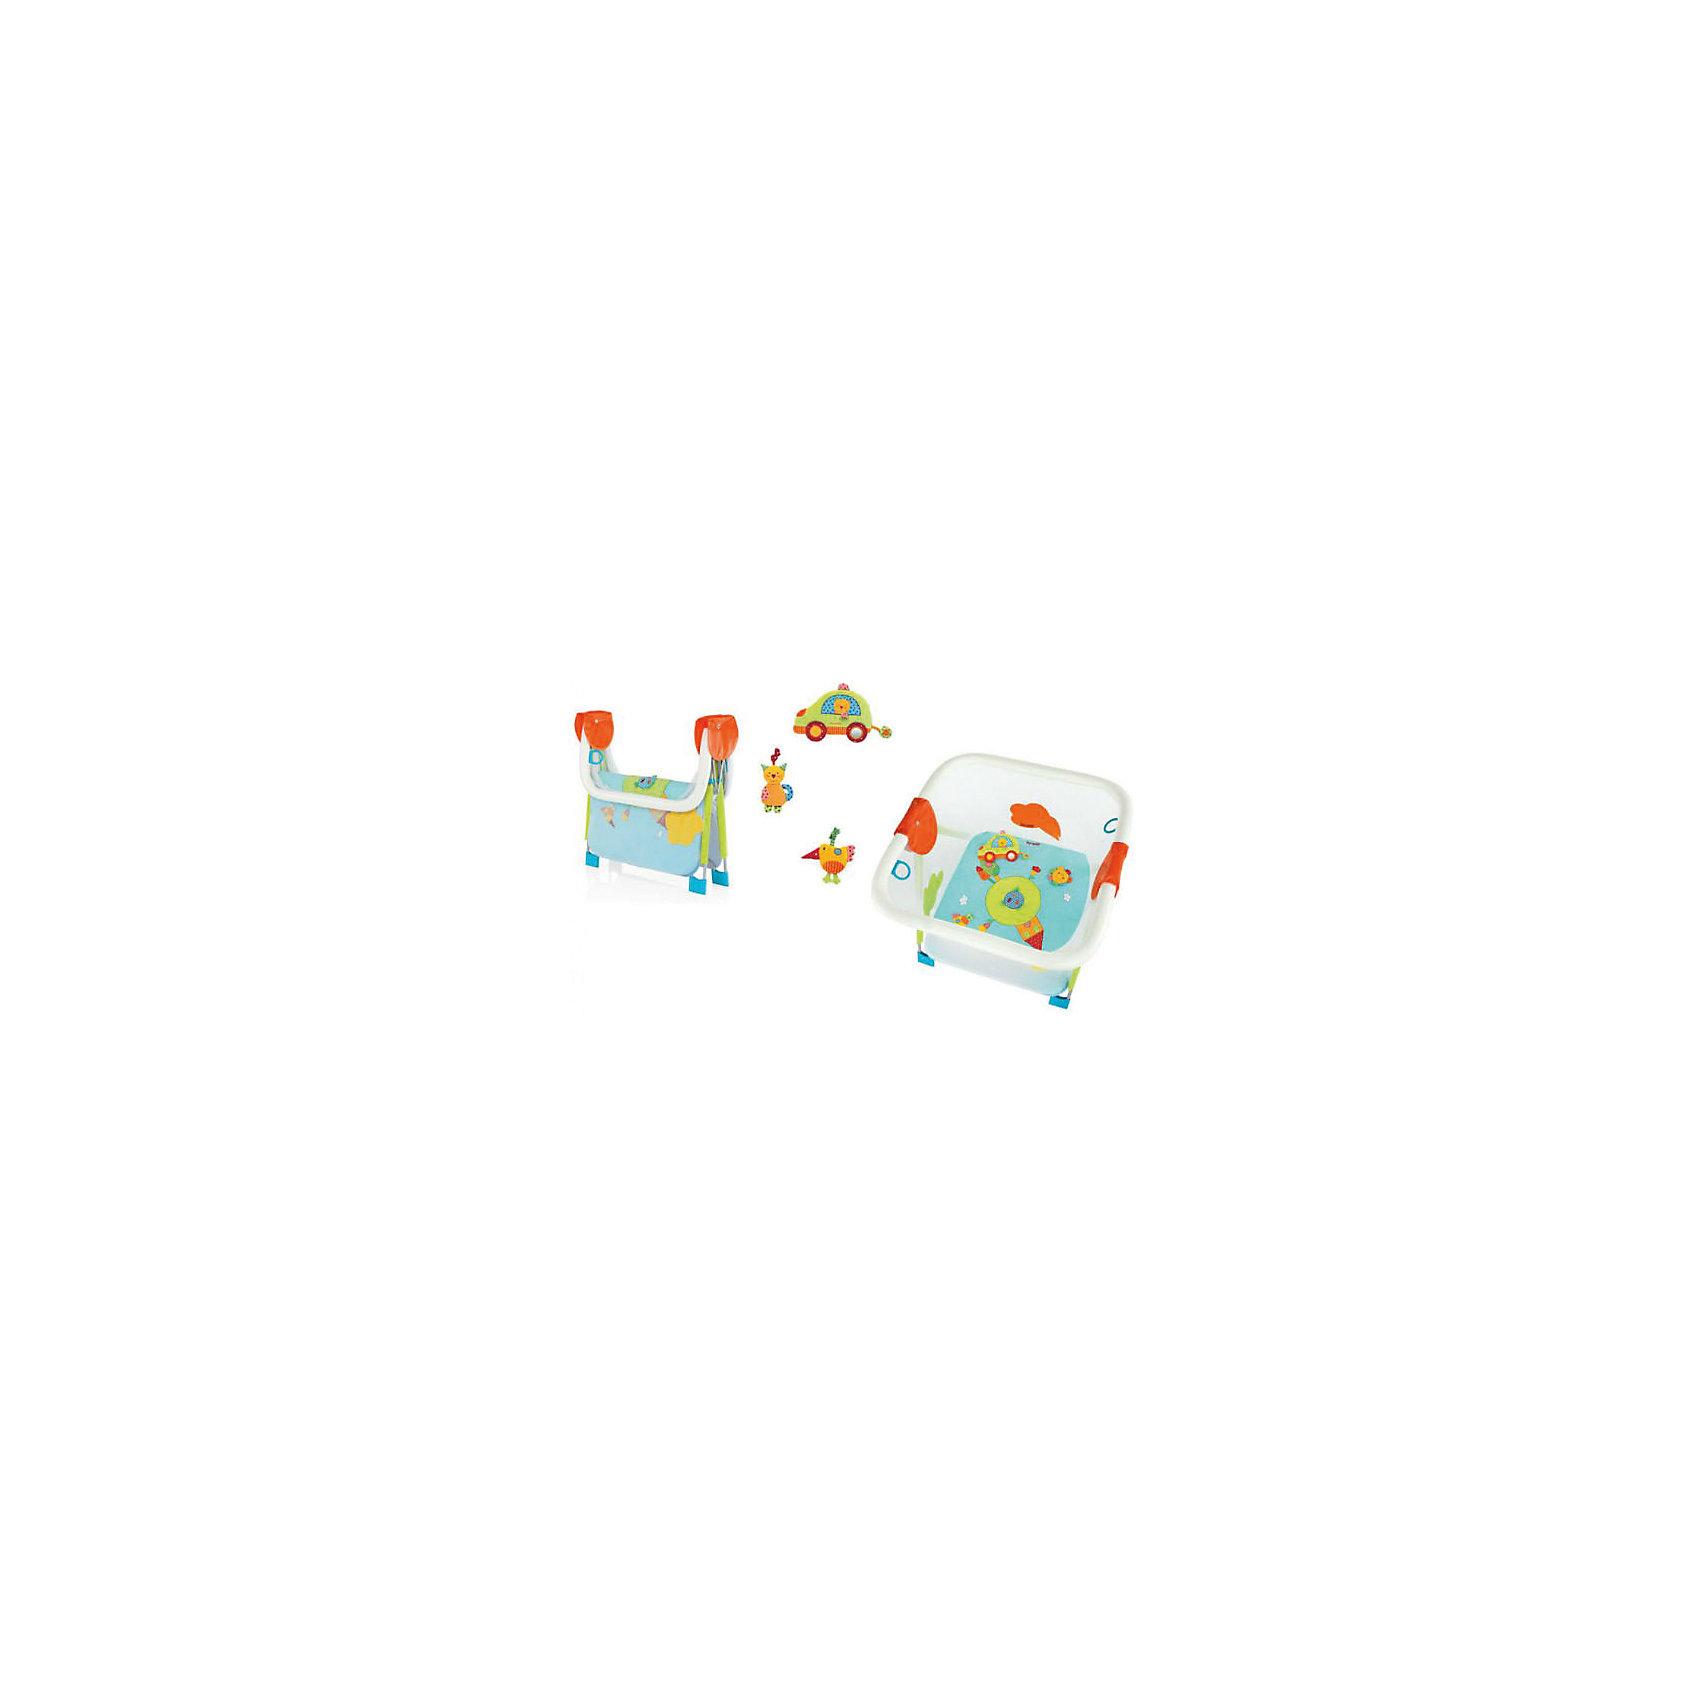 Манеж SOFT  PLAY GIRAMONDO, Brevi, голубой/зеленый/оранжевый (brevi)